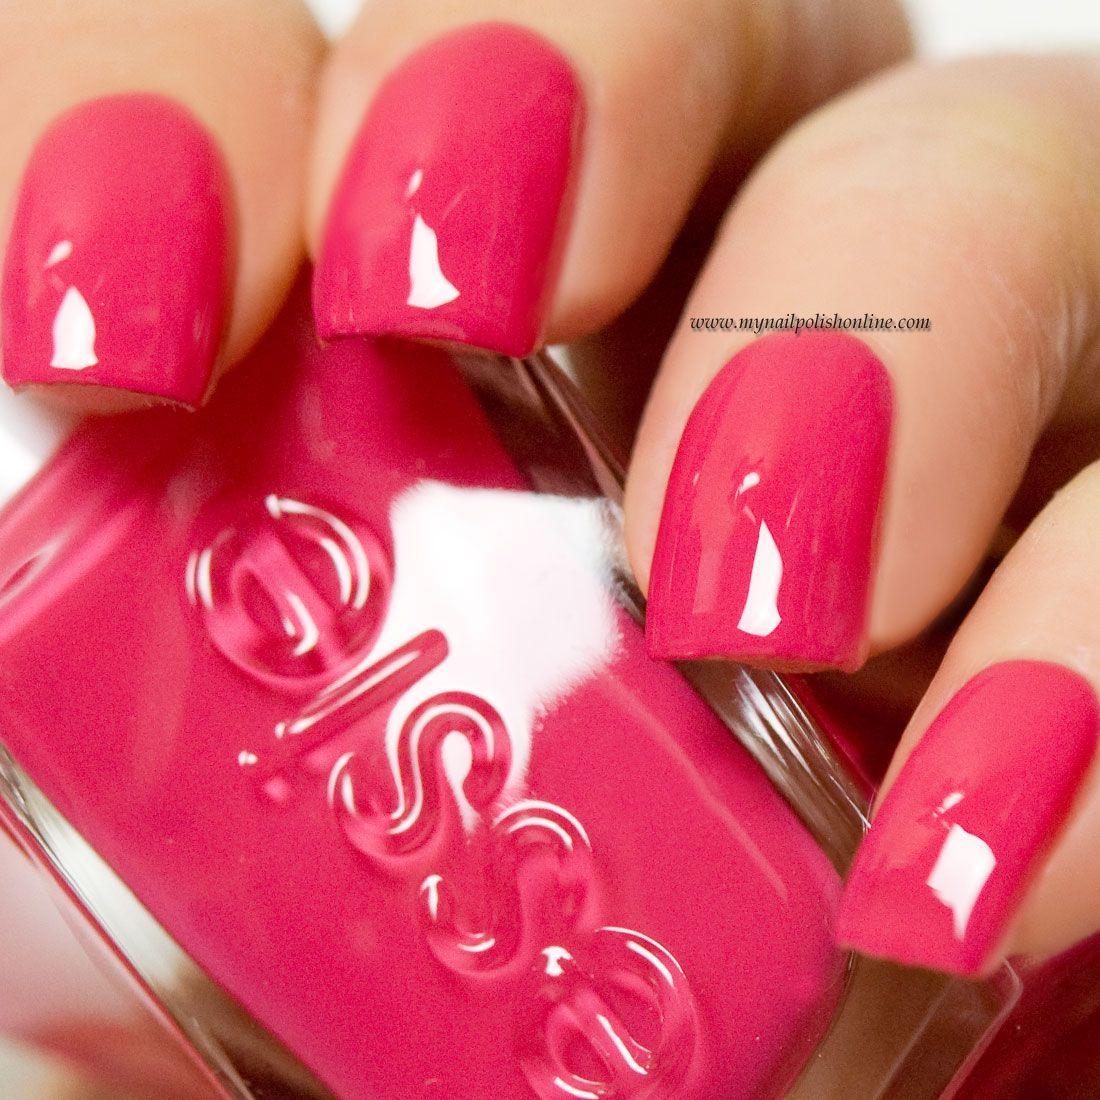 Essie - The It-factor | Factors, Essie nail polish and Nail nail